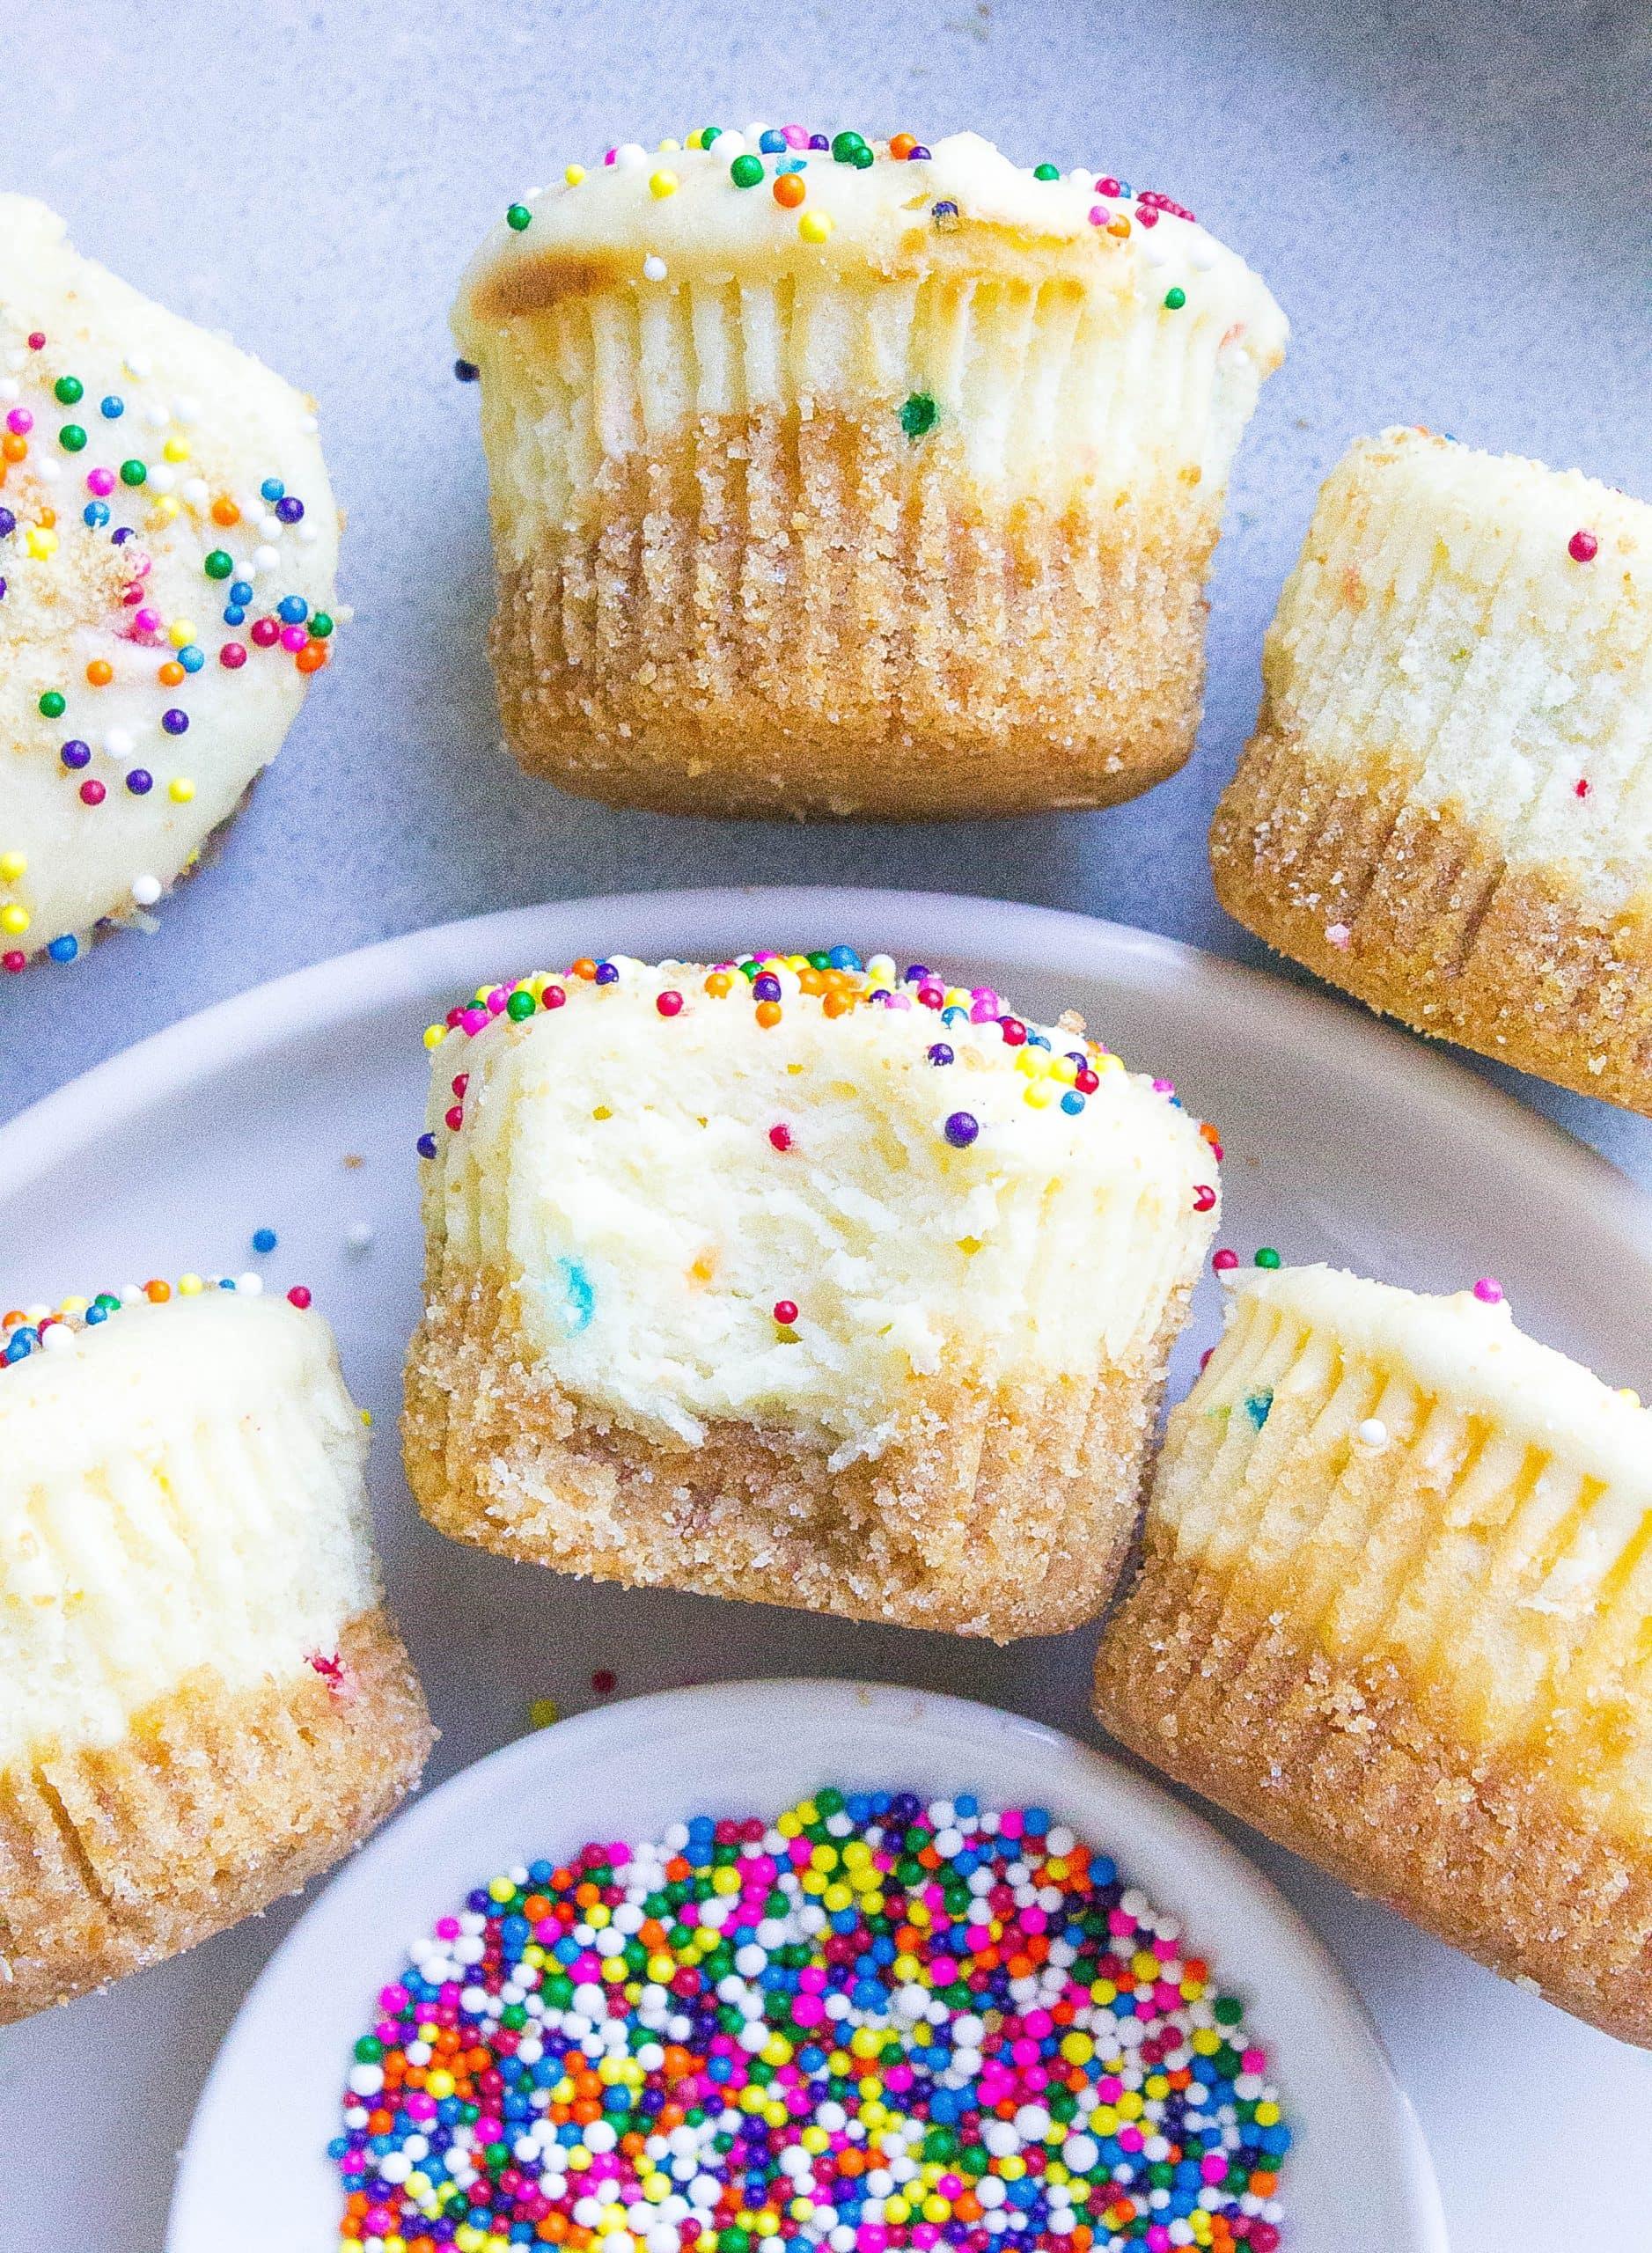 Funfetti 'Dunkaroo' Cheesecake Bites